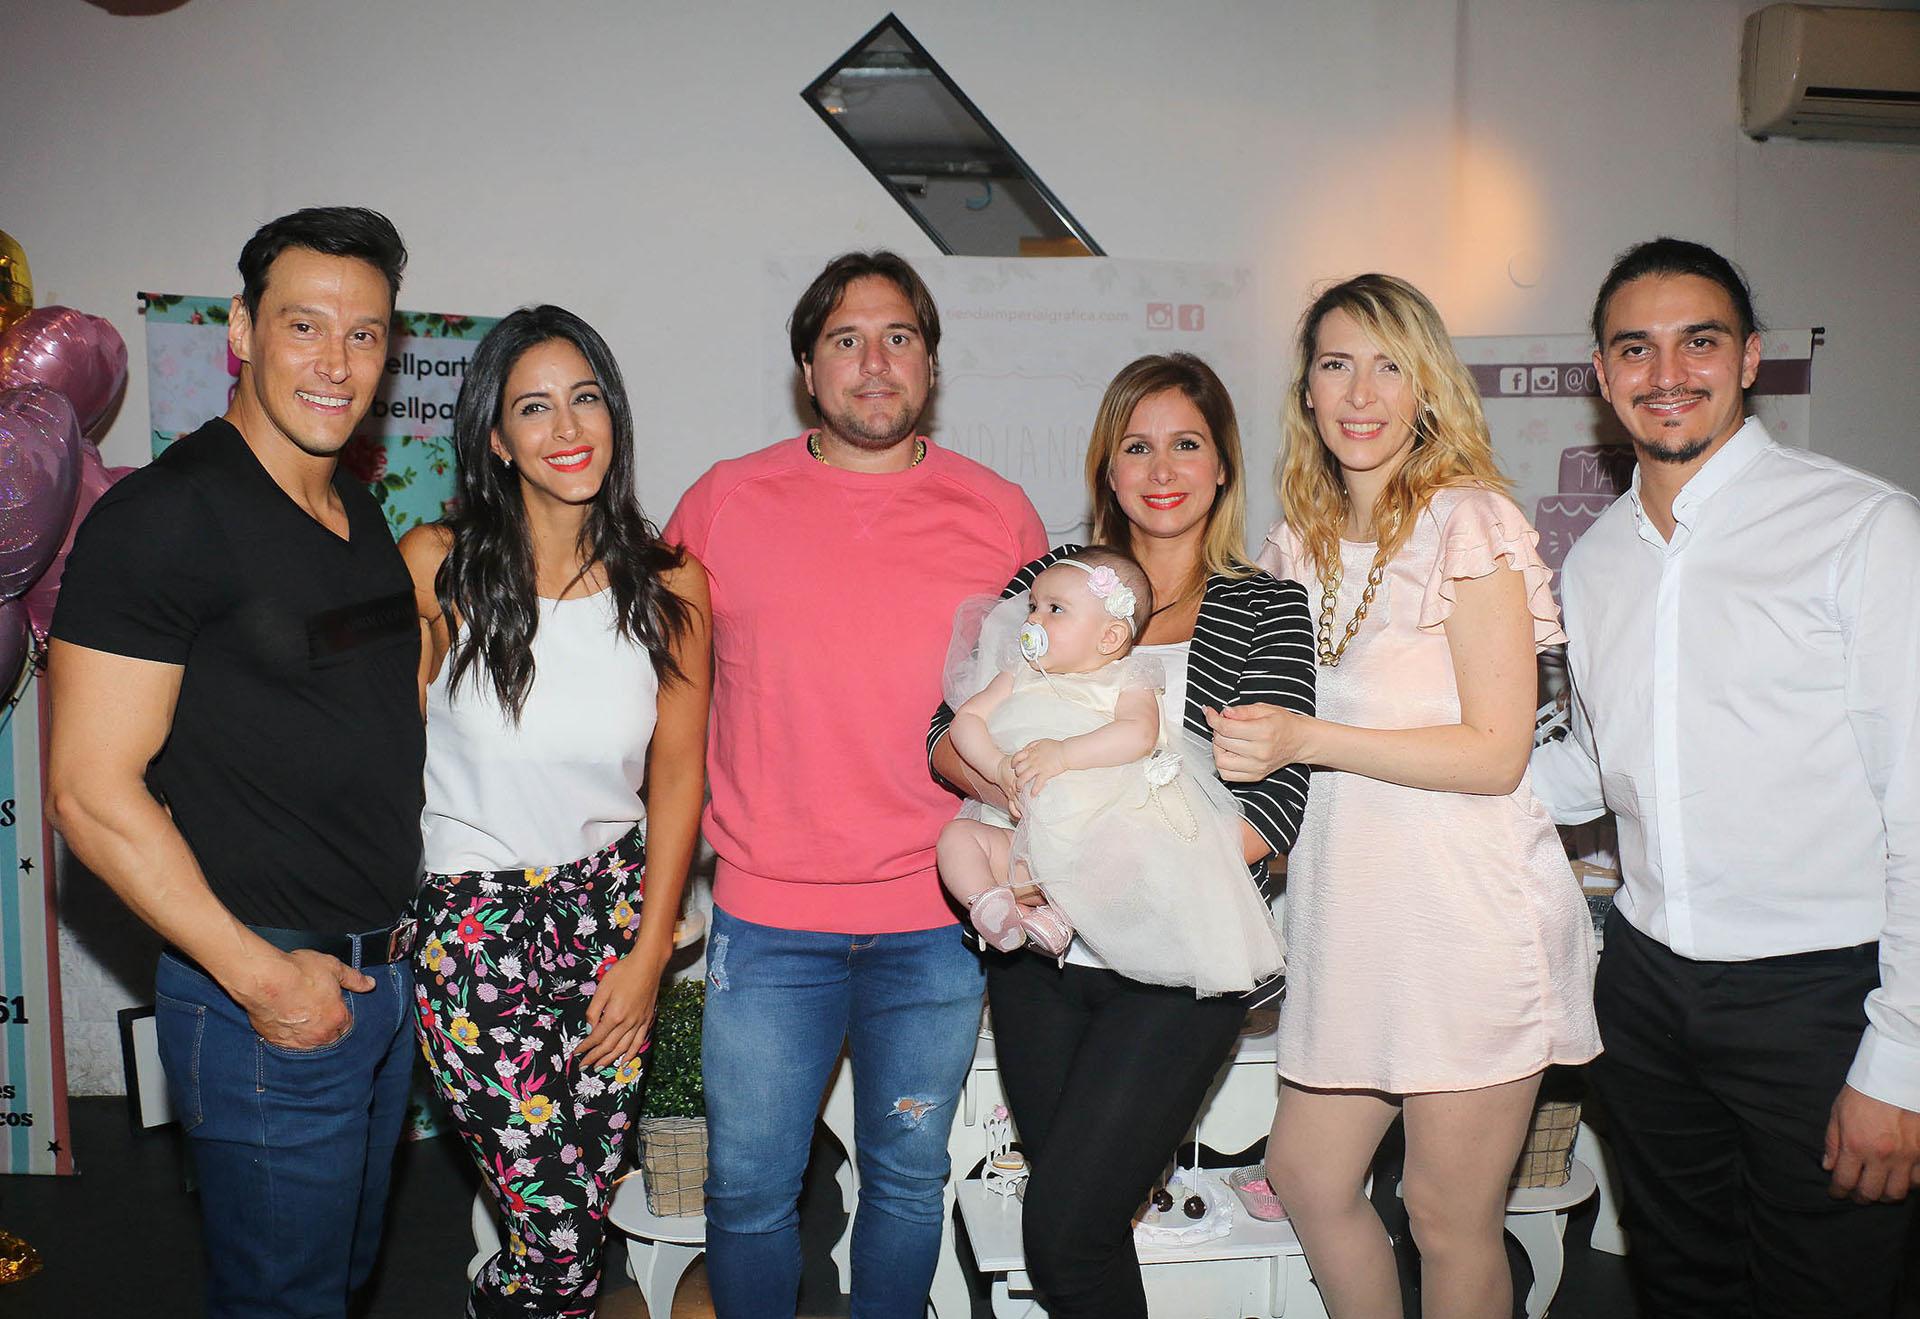 Joel Ledesma, Celeste Muriega, Sebastián Cobelli, Fernanda Vives, Lorena Liggi y Leandro D´Angelo con Indiana